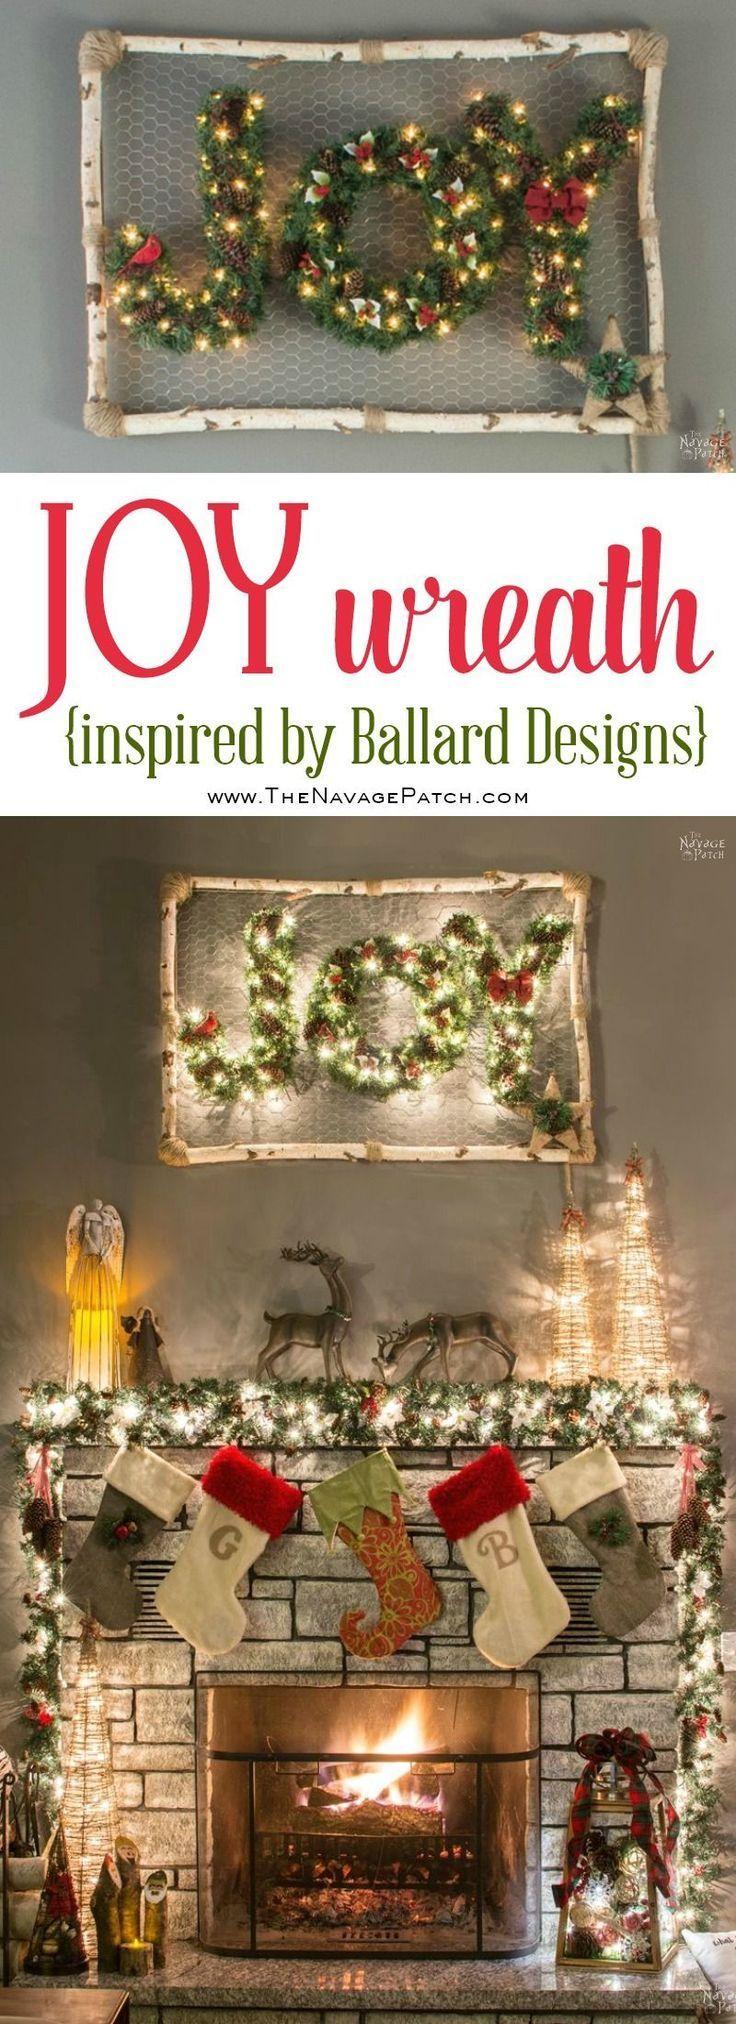 JOY Wreath Inspired By Ballard Designs